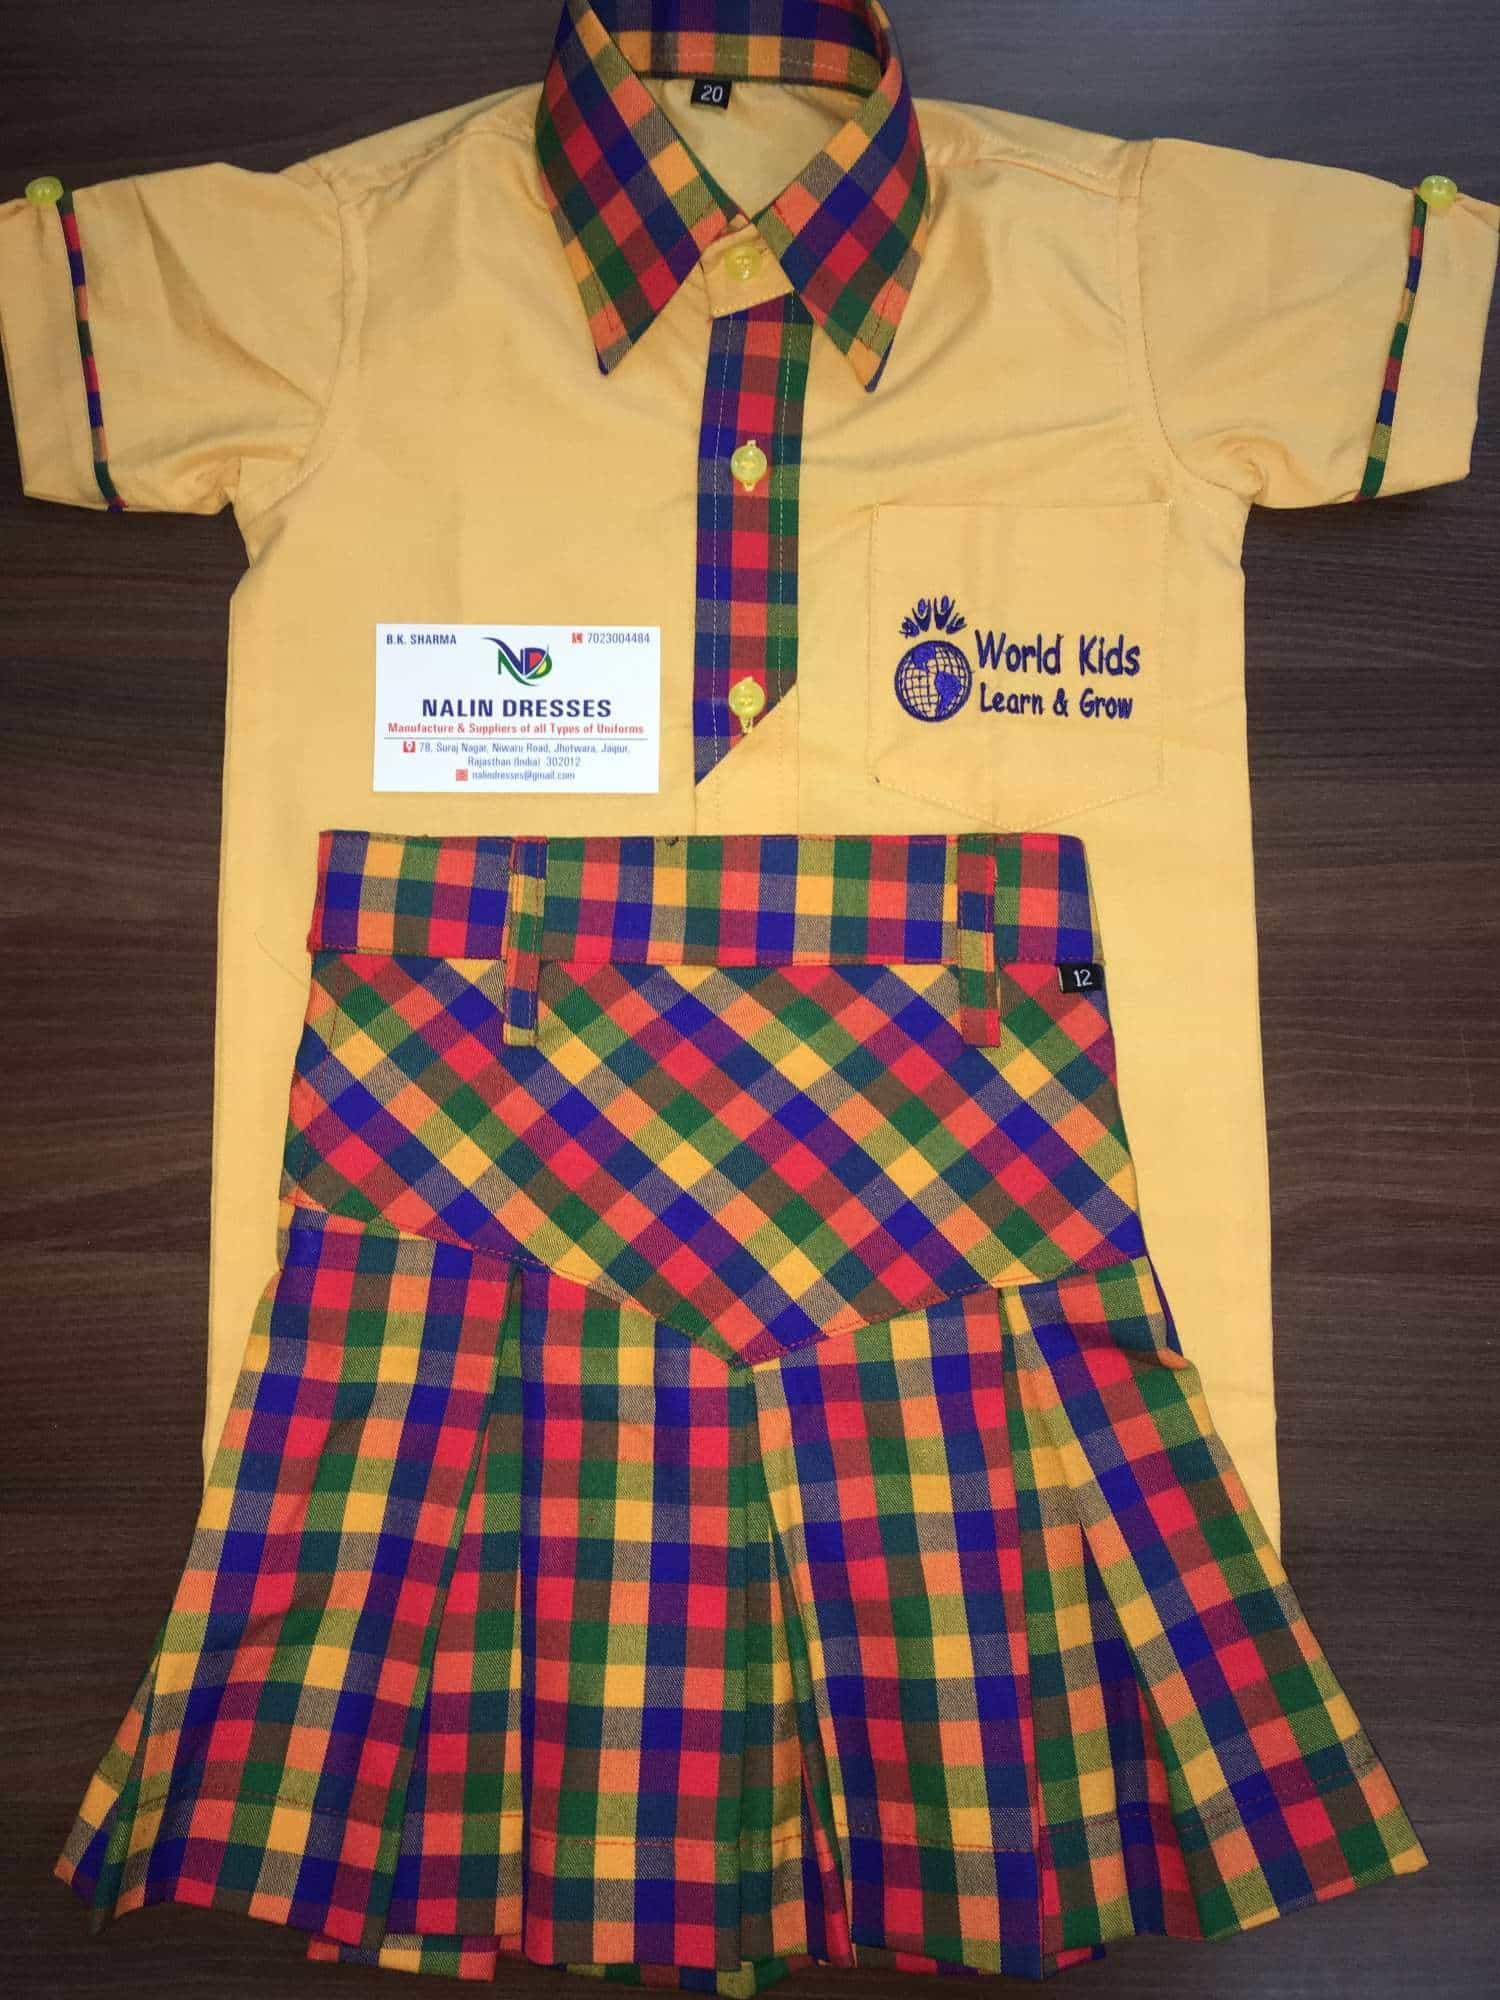 ac91d0b3407 Nalin Dresses, Jhotwara - Corporate Uniform Manufacturers in Jaipur -  Justdial